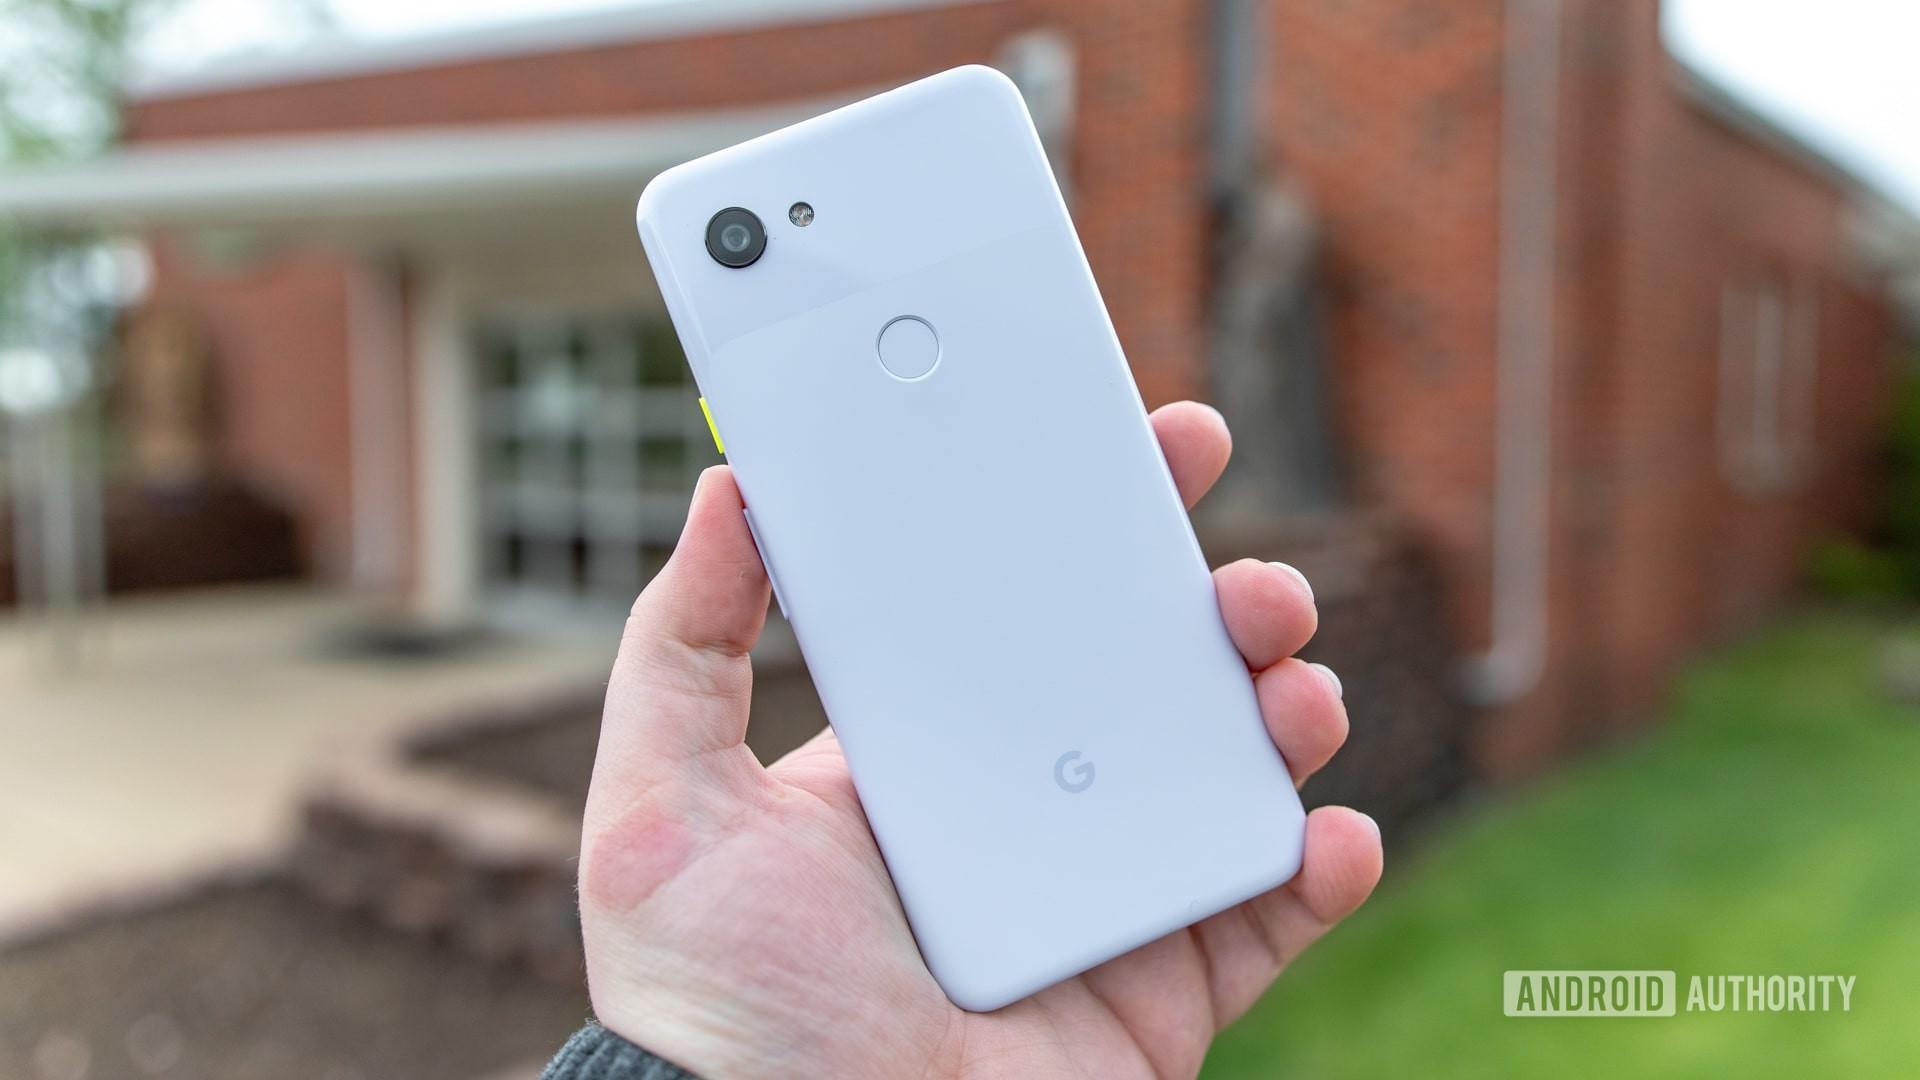 Google Pixel 3a Purple-ish Rear